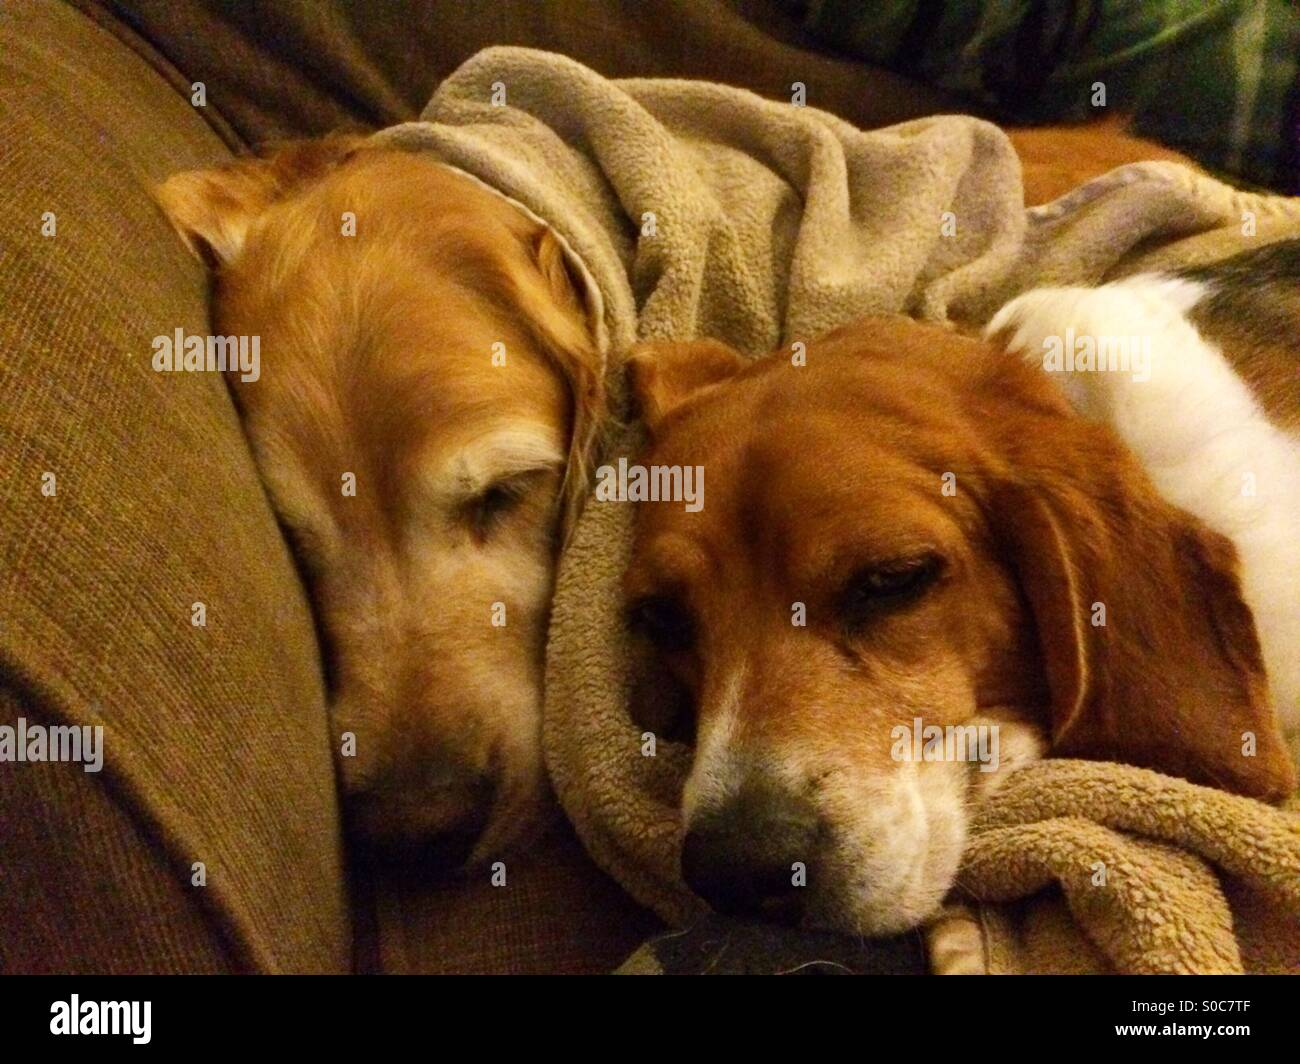 Dogs sleeping Stock Photo